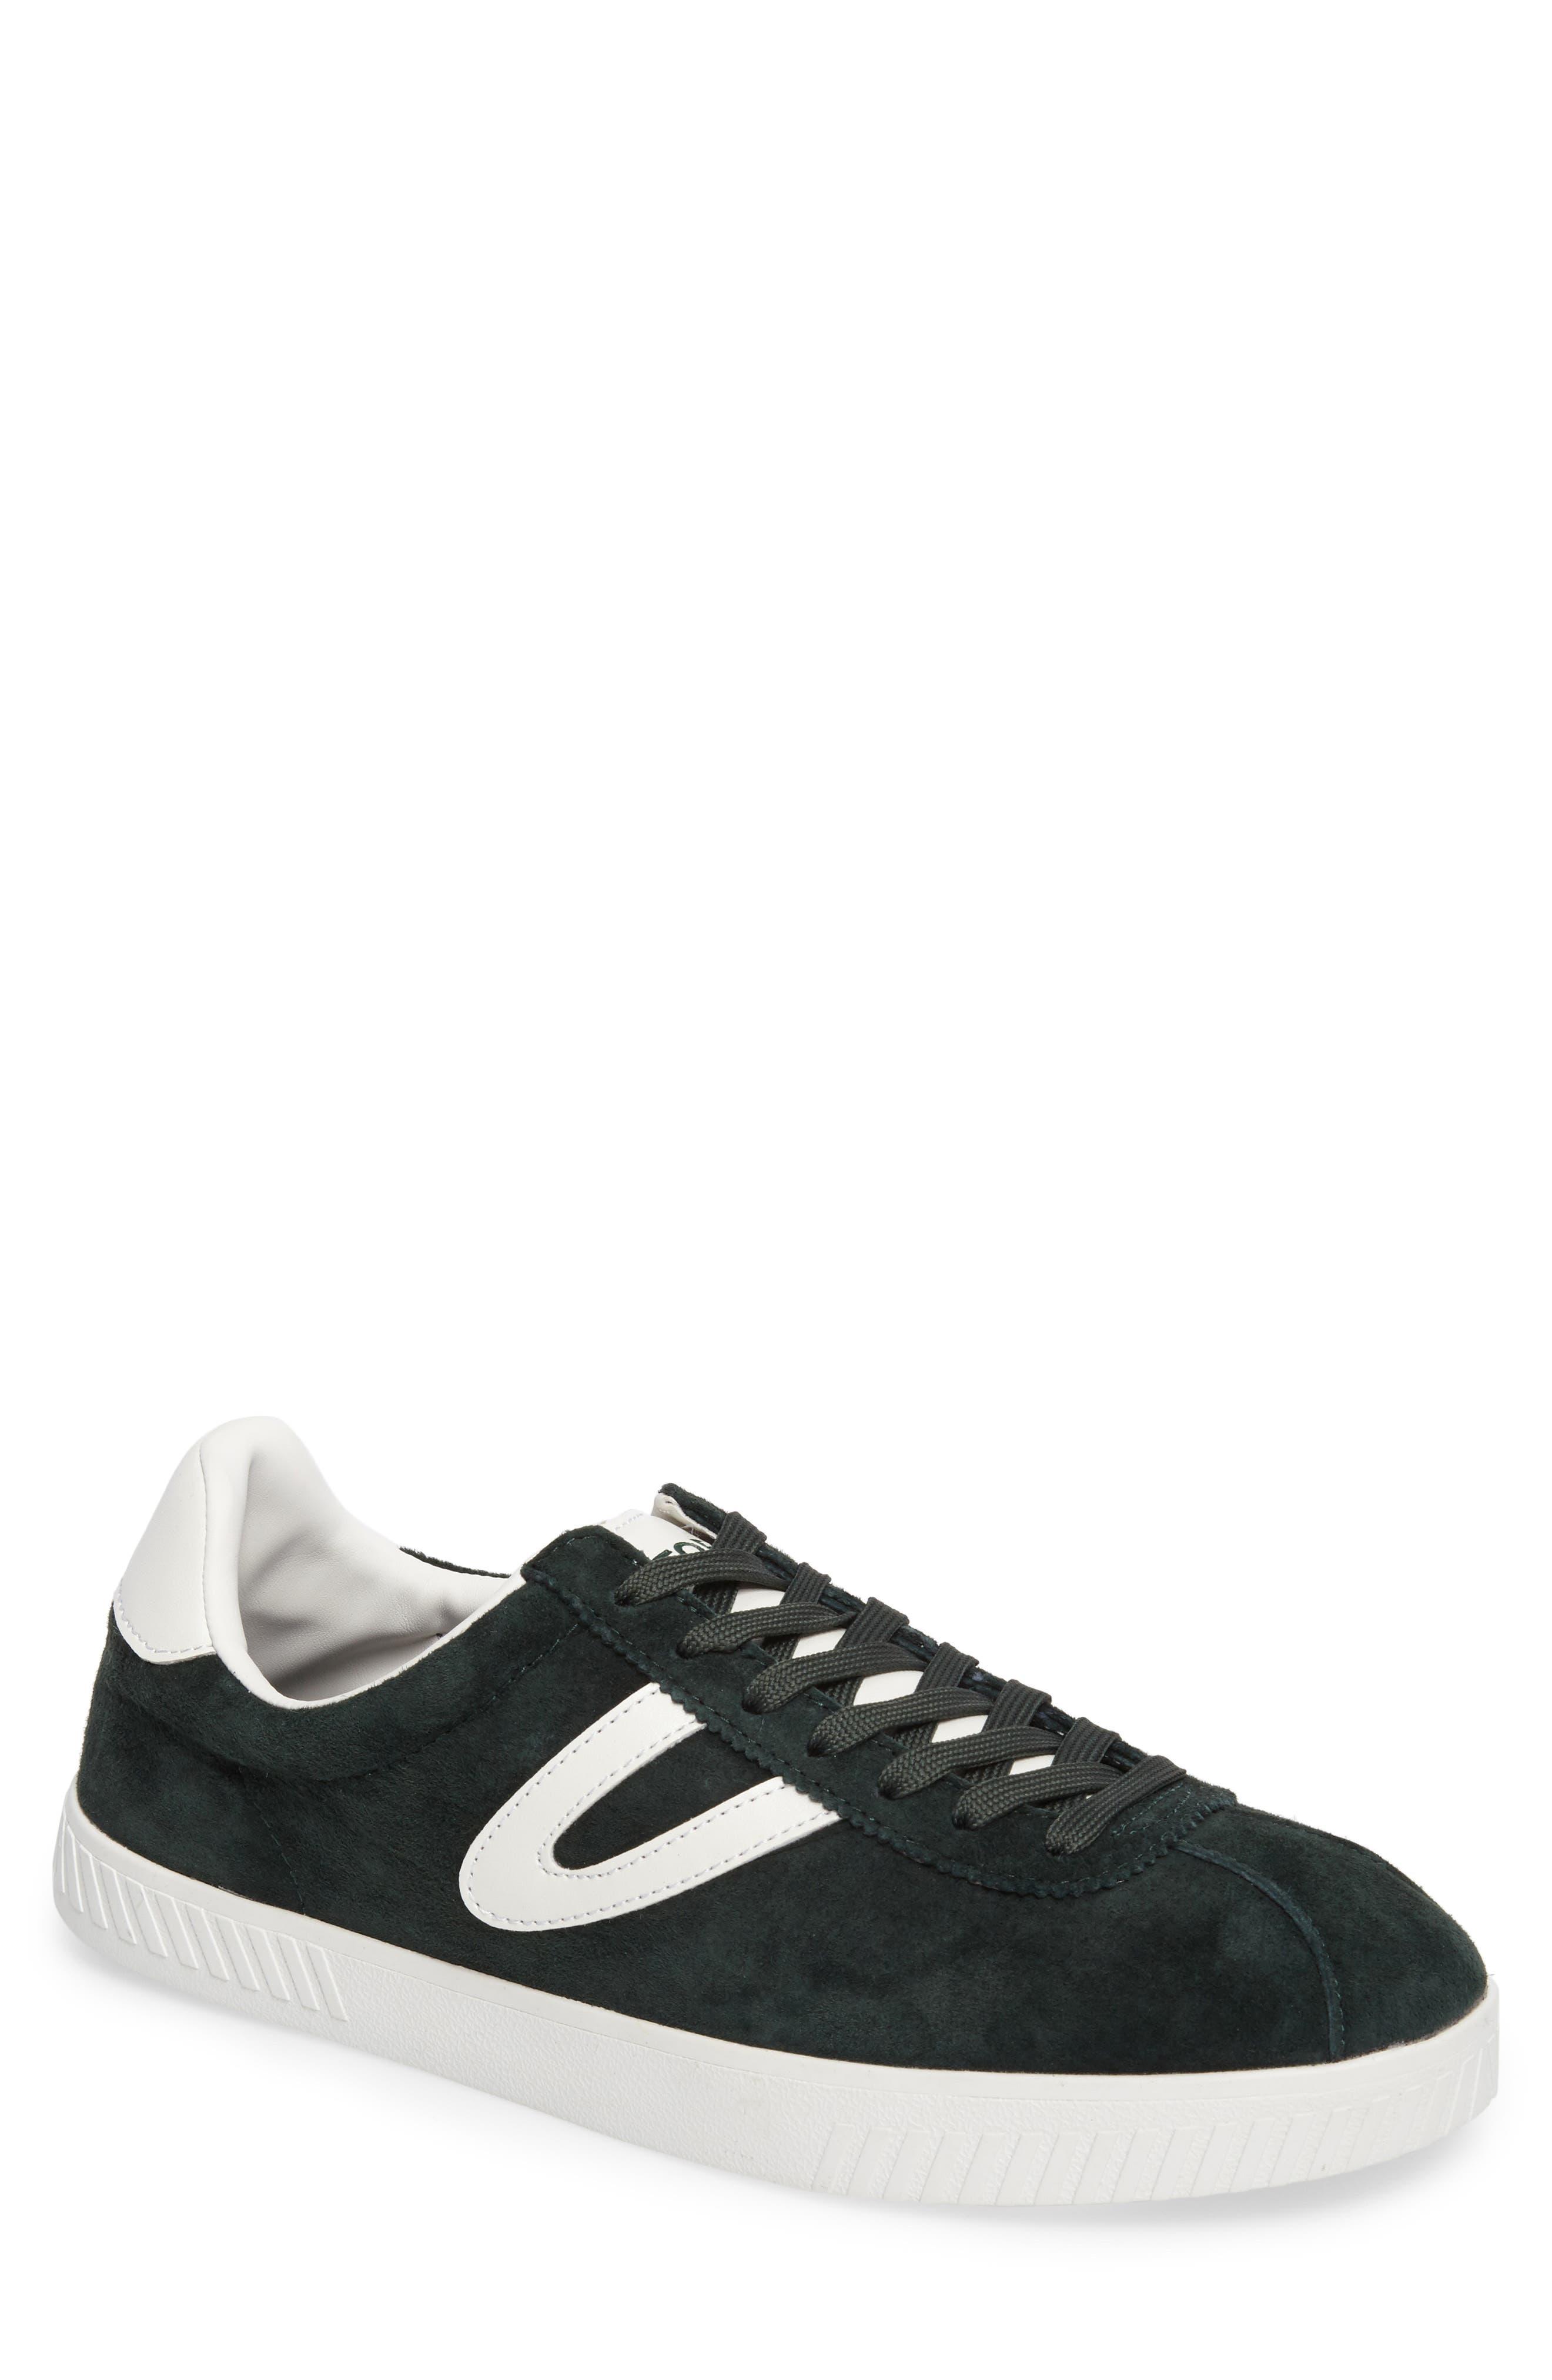 Main Image - Tretorn Camden 3 Sneaker (Men)